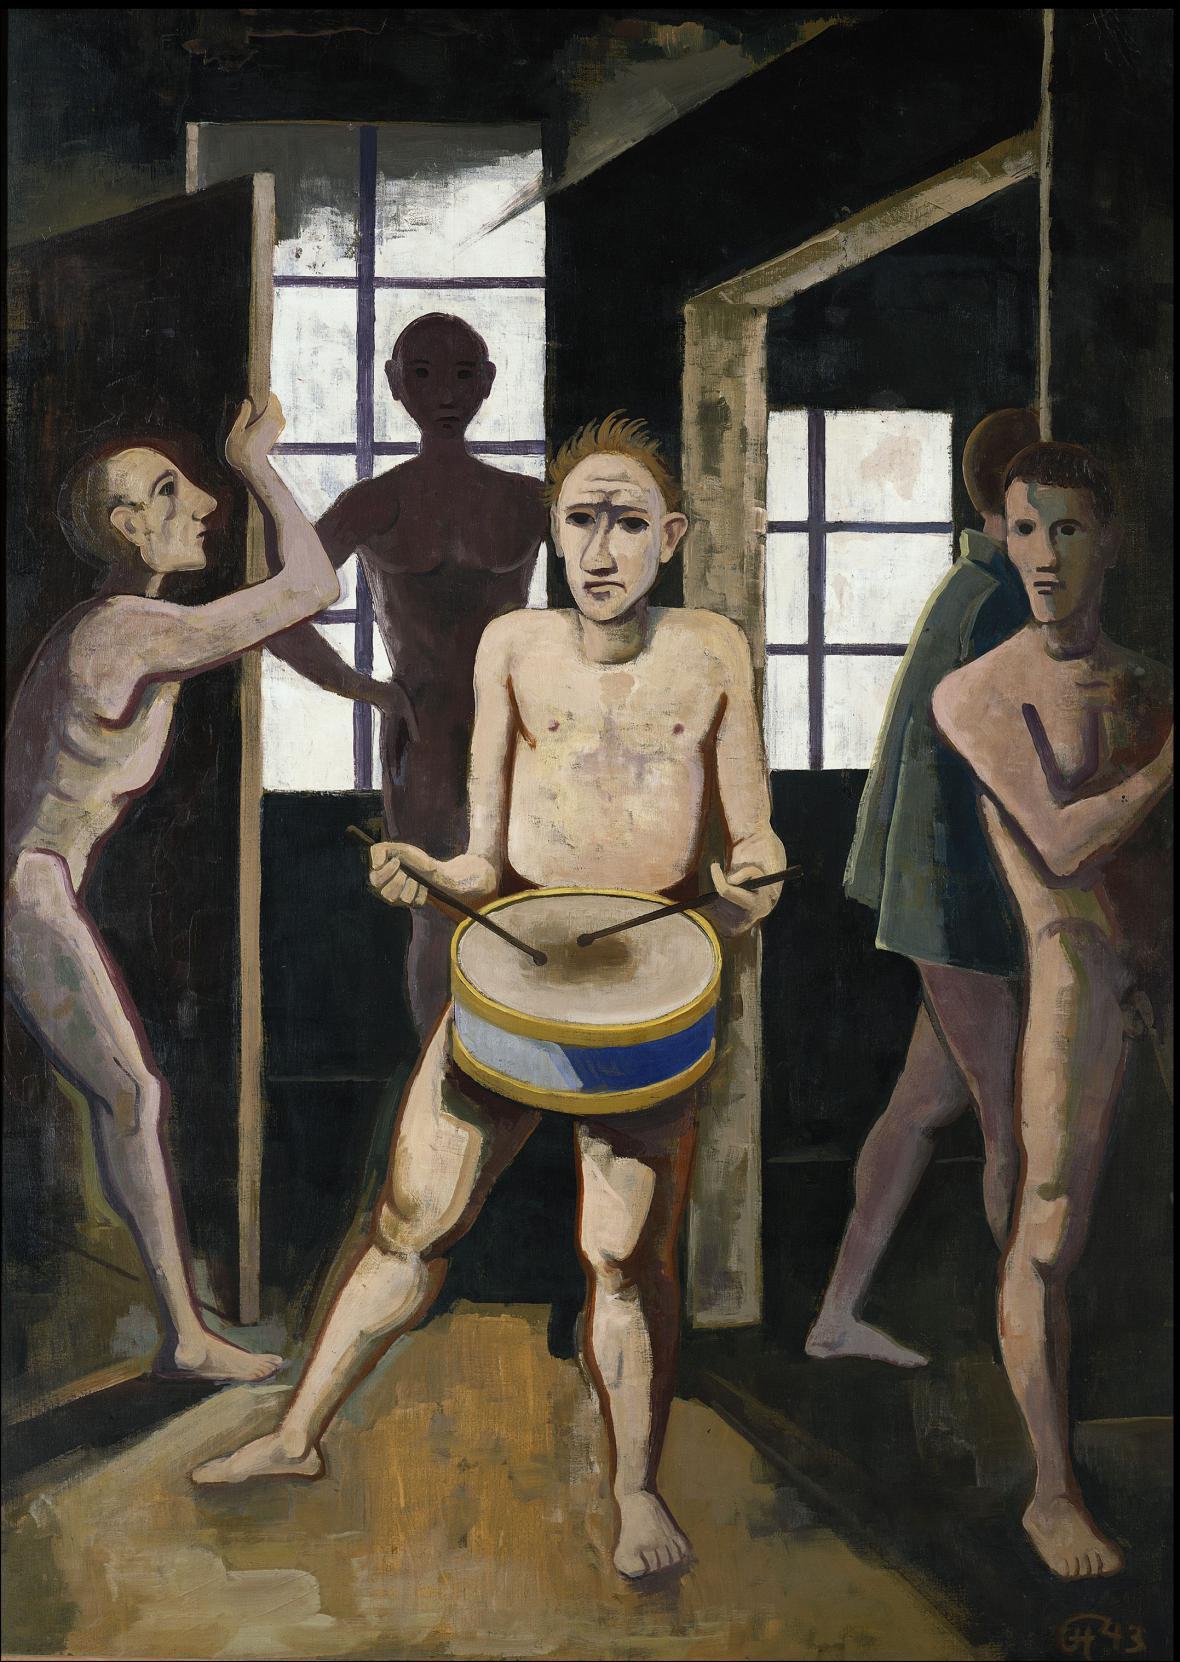 Karl Hofer / Temný pokoj, 1943